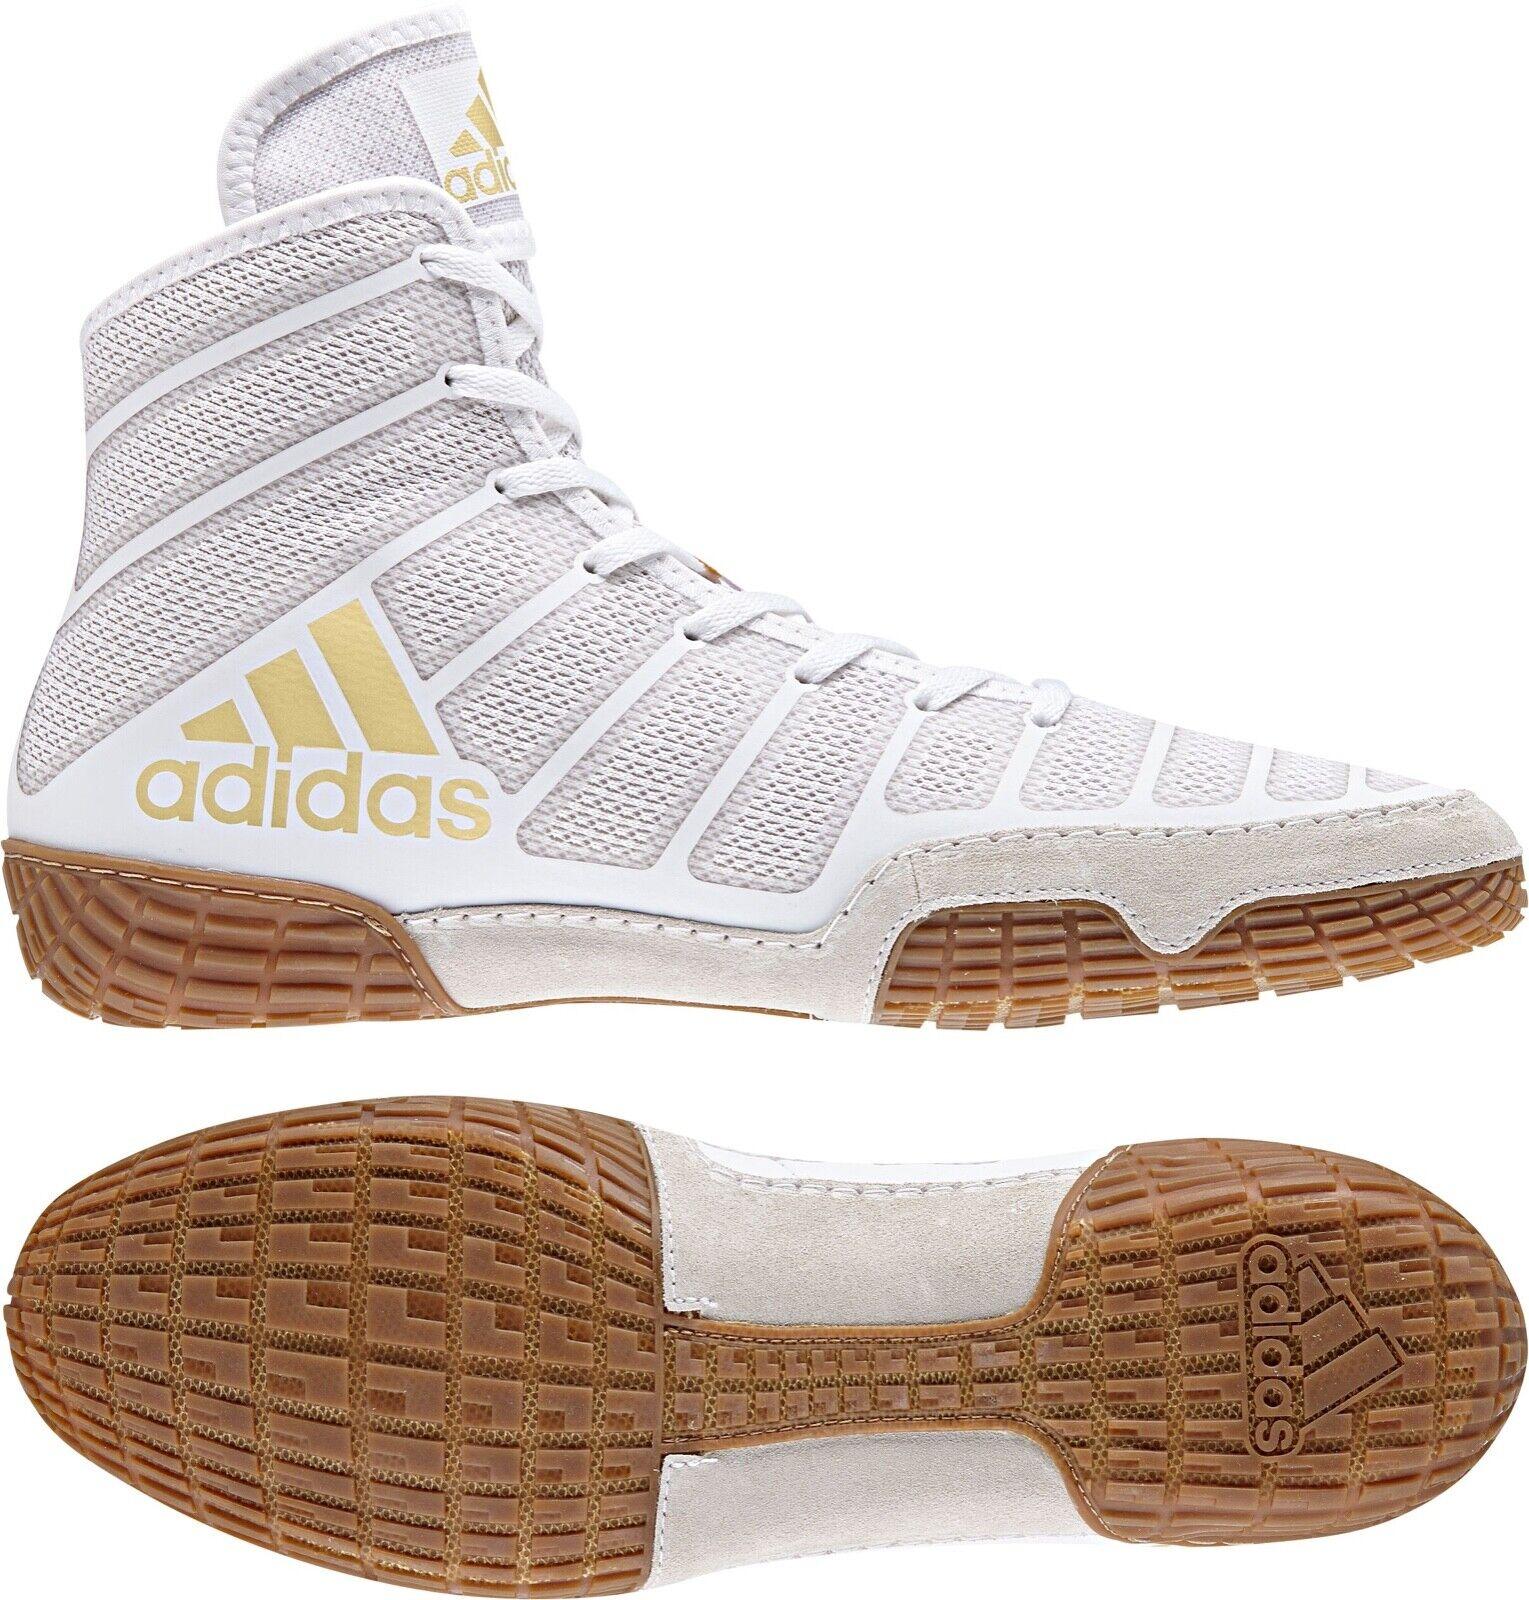 adidas Adizero John Varner Wrestling Shoes Da9891 White Gold Men Size 6